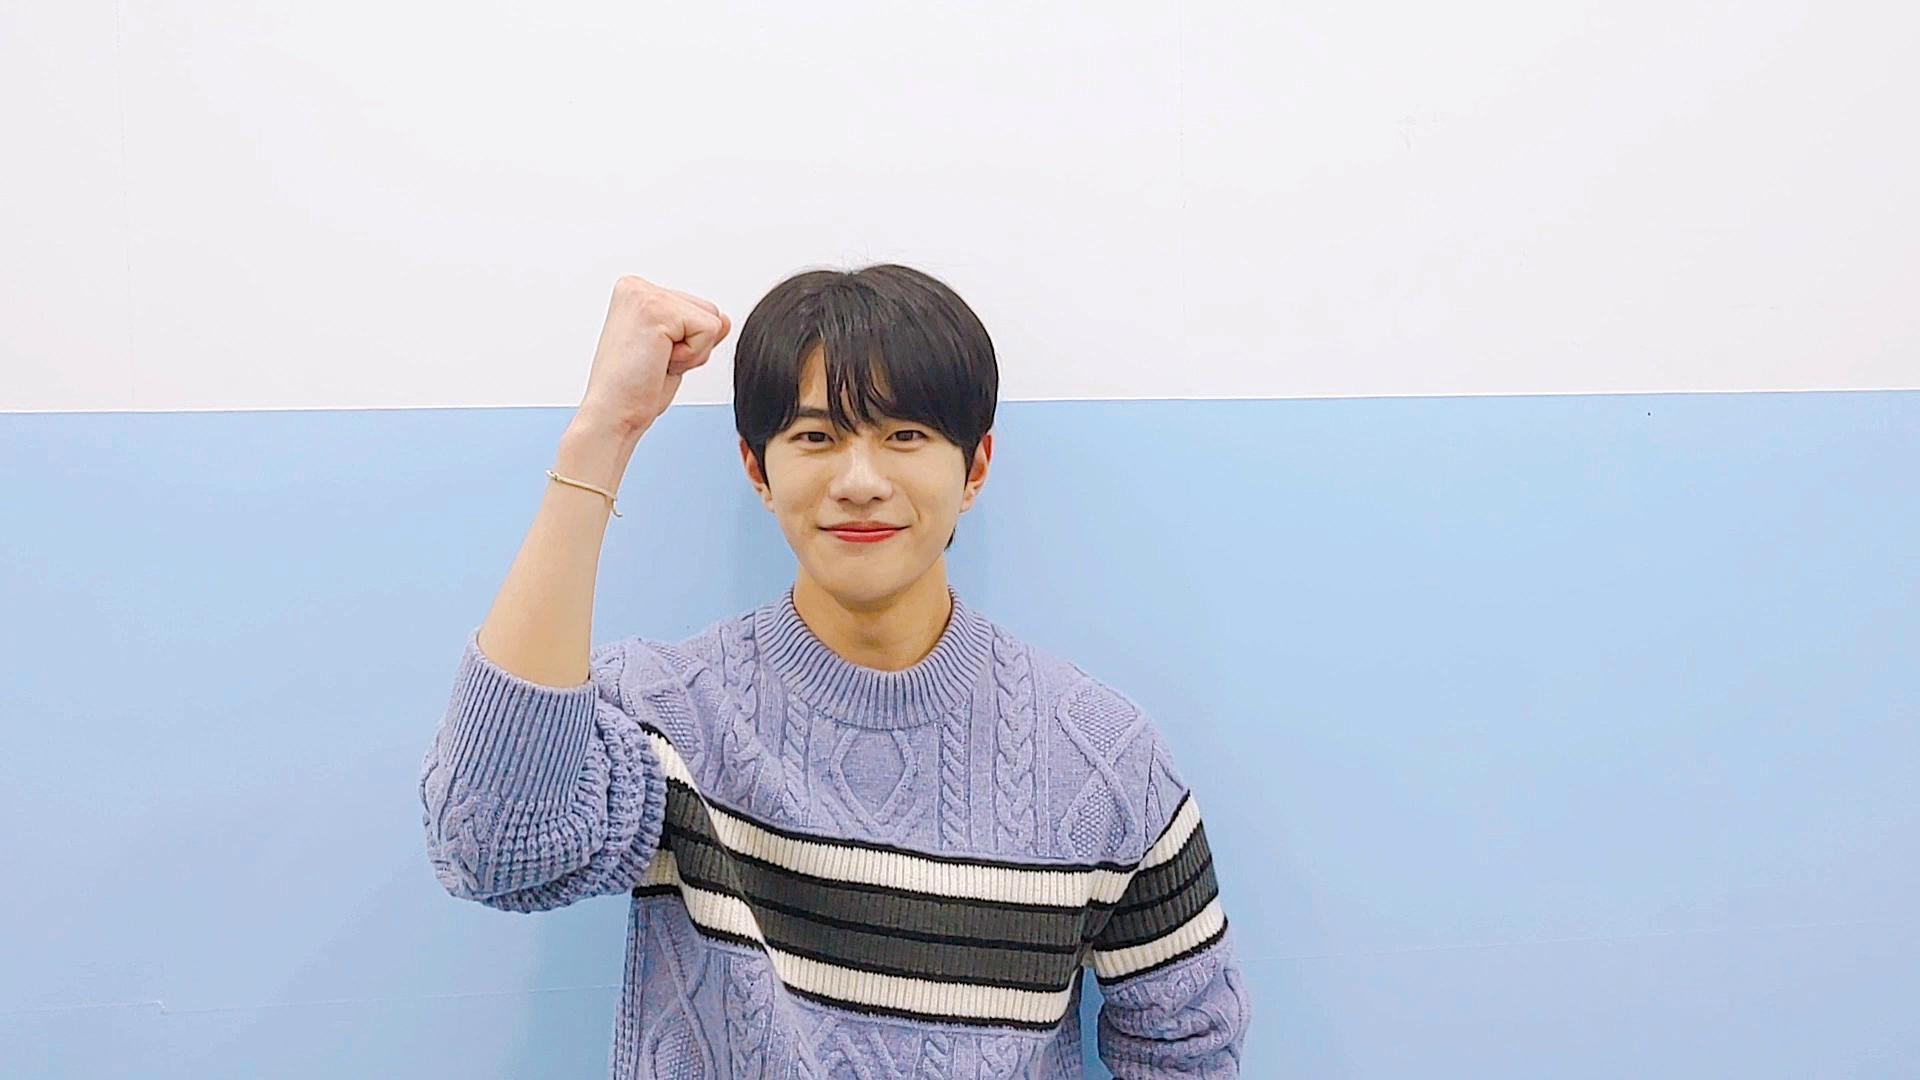 [23 NOV 7:00 PM KST] Unite ON: Live Concert Greeting from BOMIN